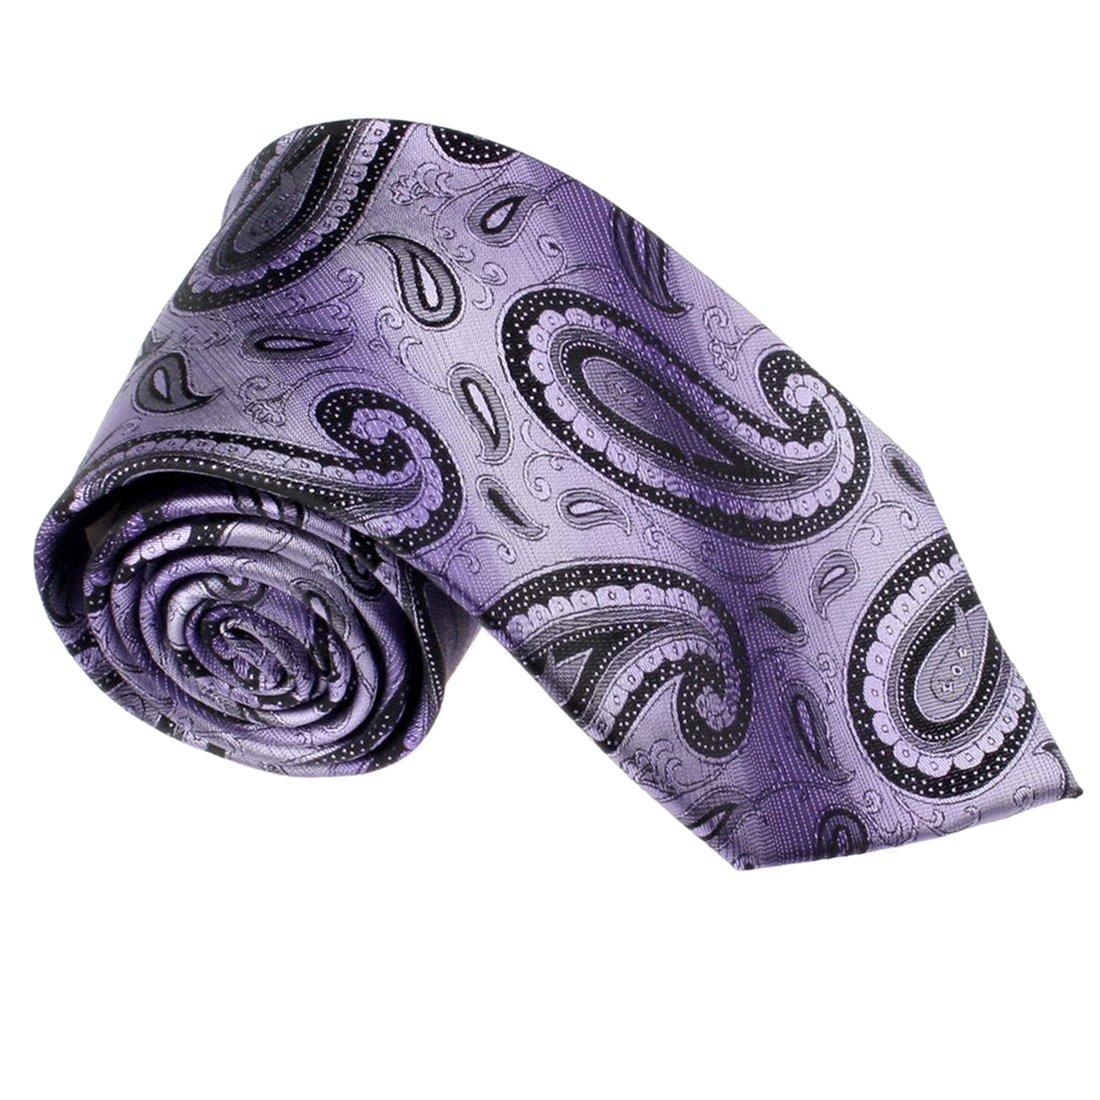 T8335 Purple Paisley Woven Silk Necktie Birthday Presents Box Set By Y&G